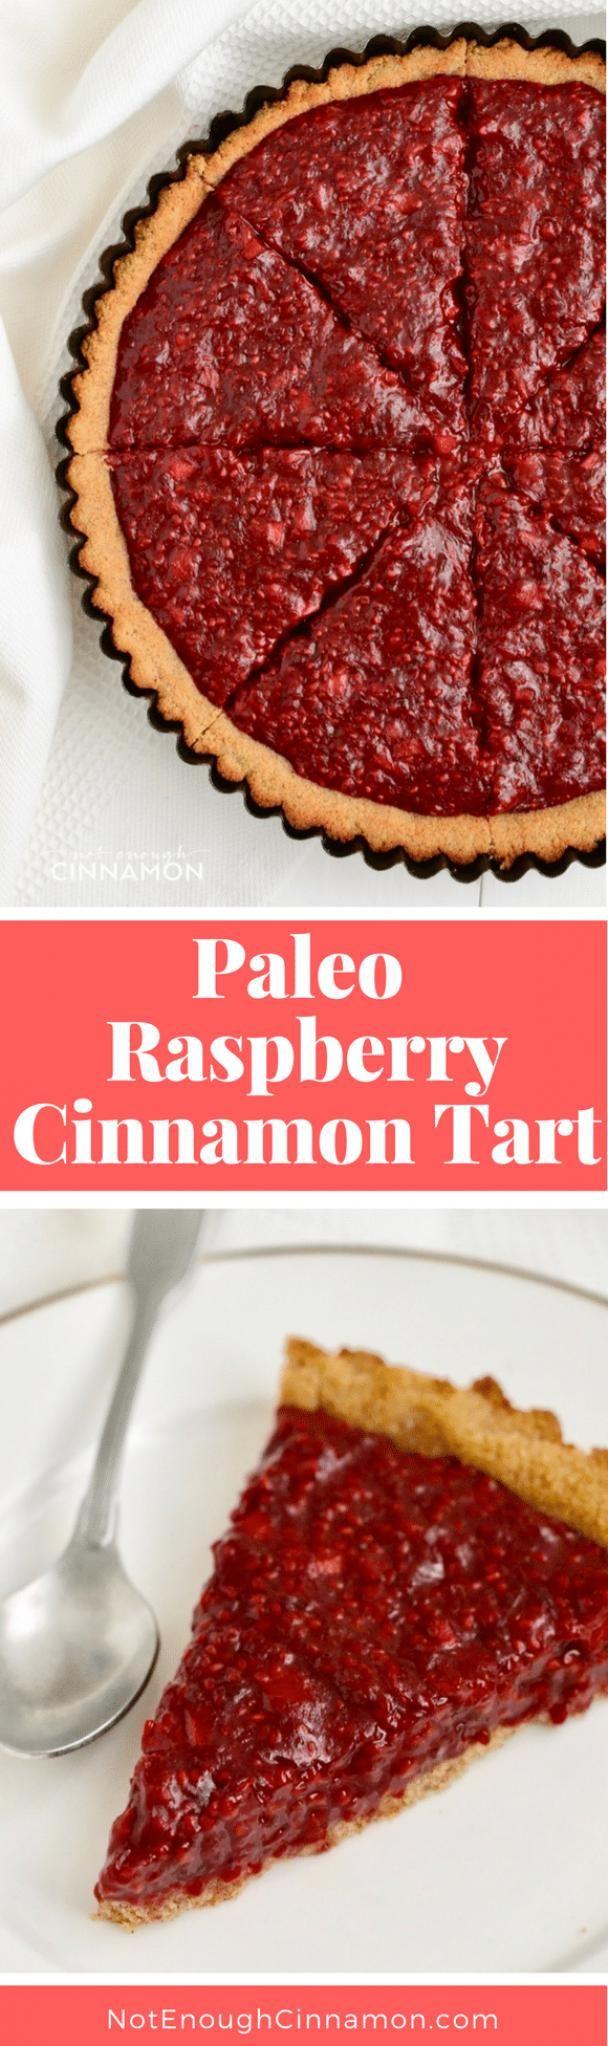 Paleo Raspberry Cinnamon Tart - Not Enough Cinnamon #paleodessert